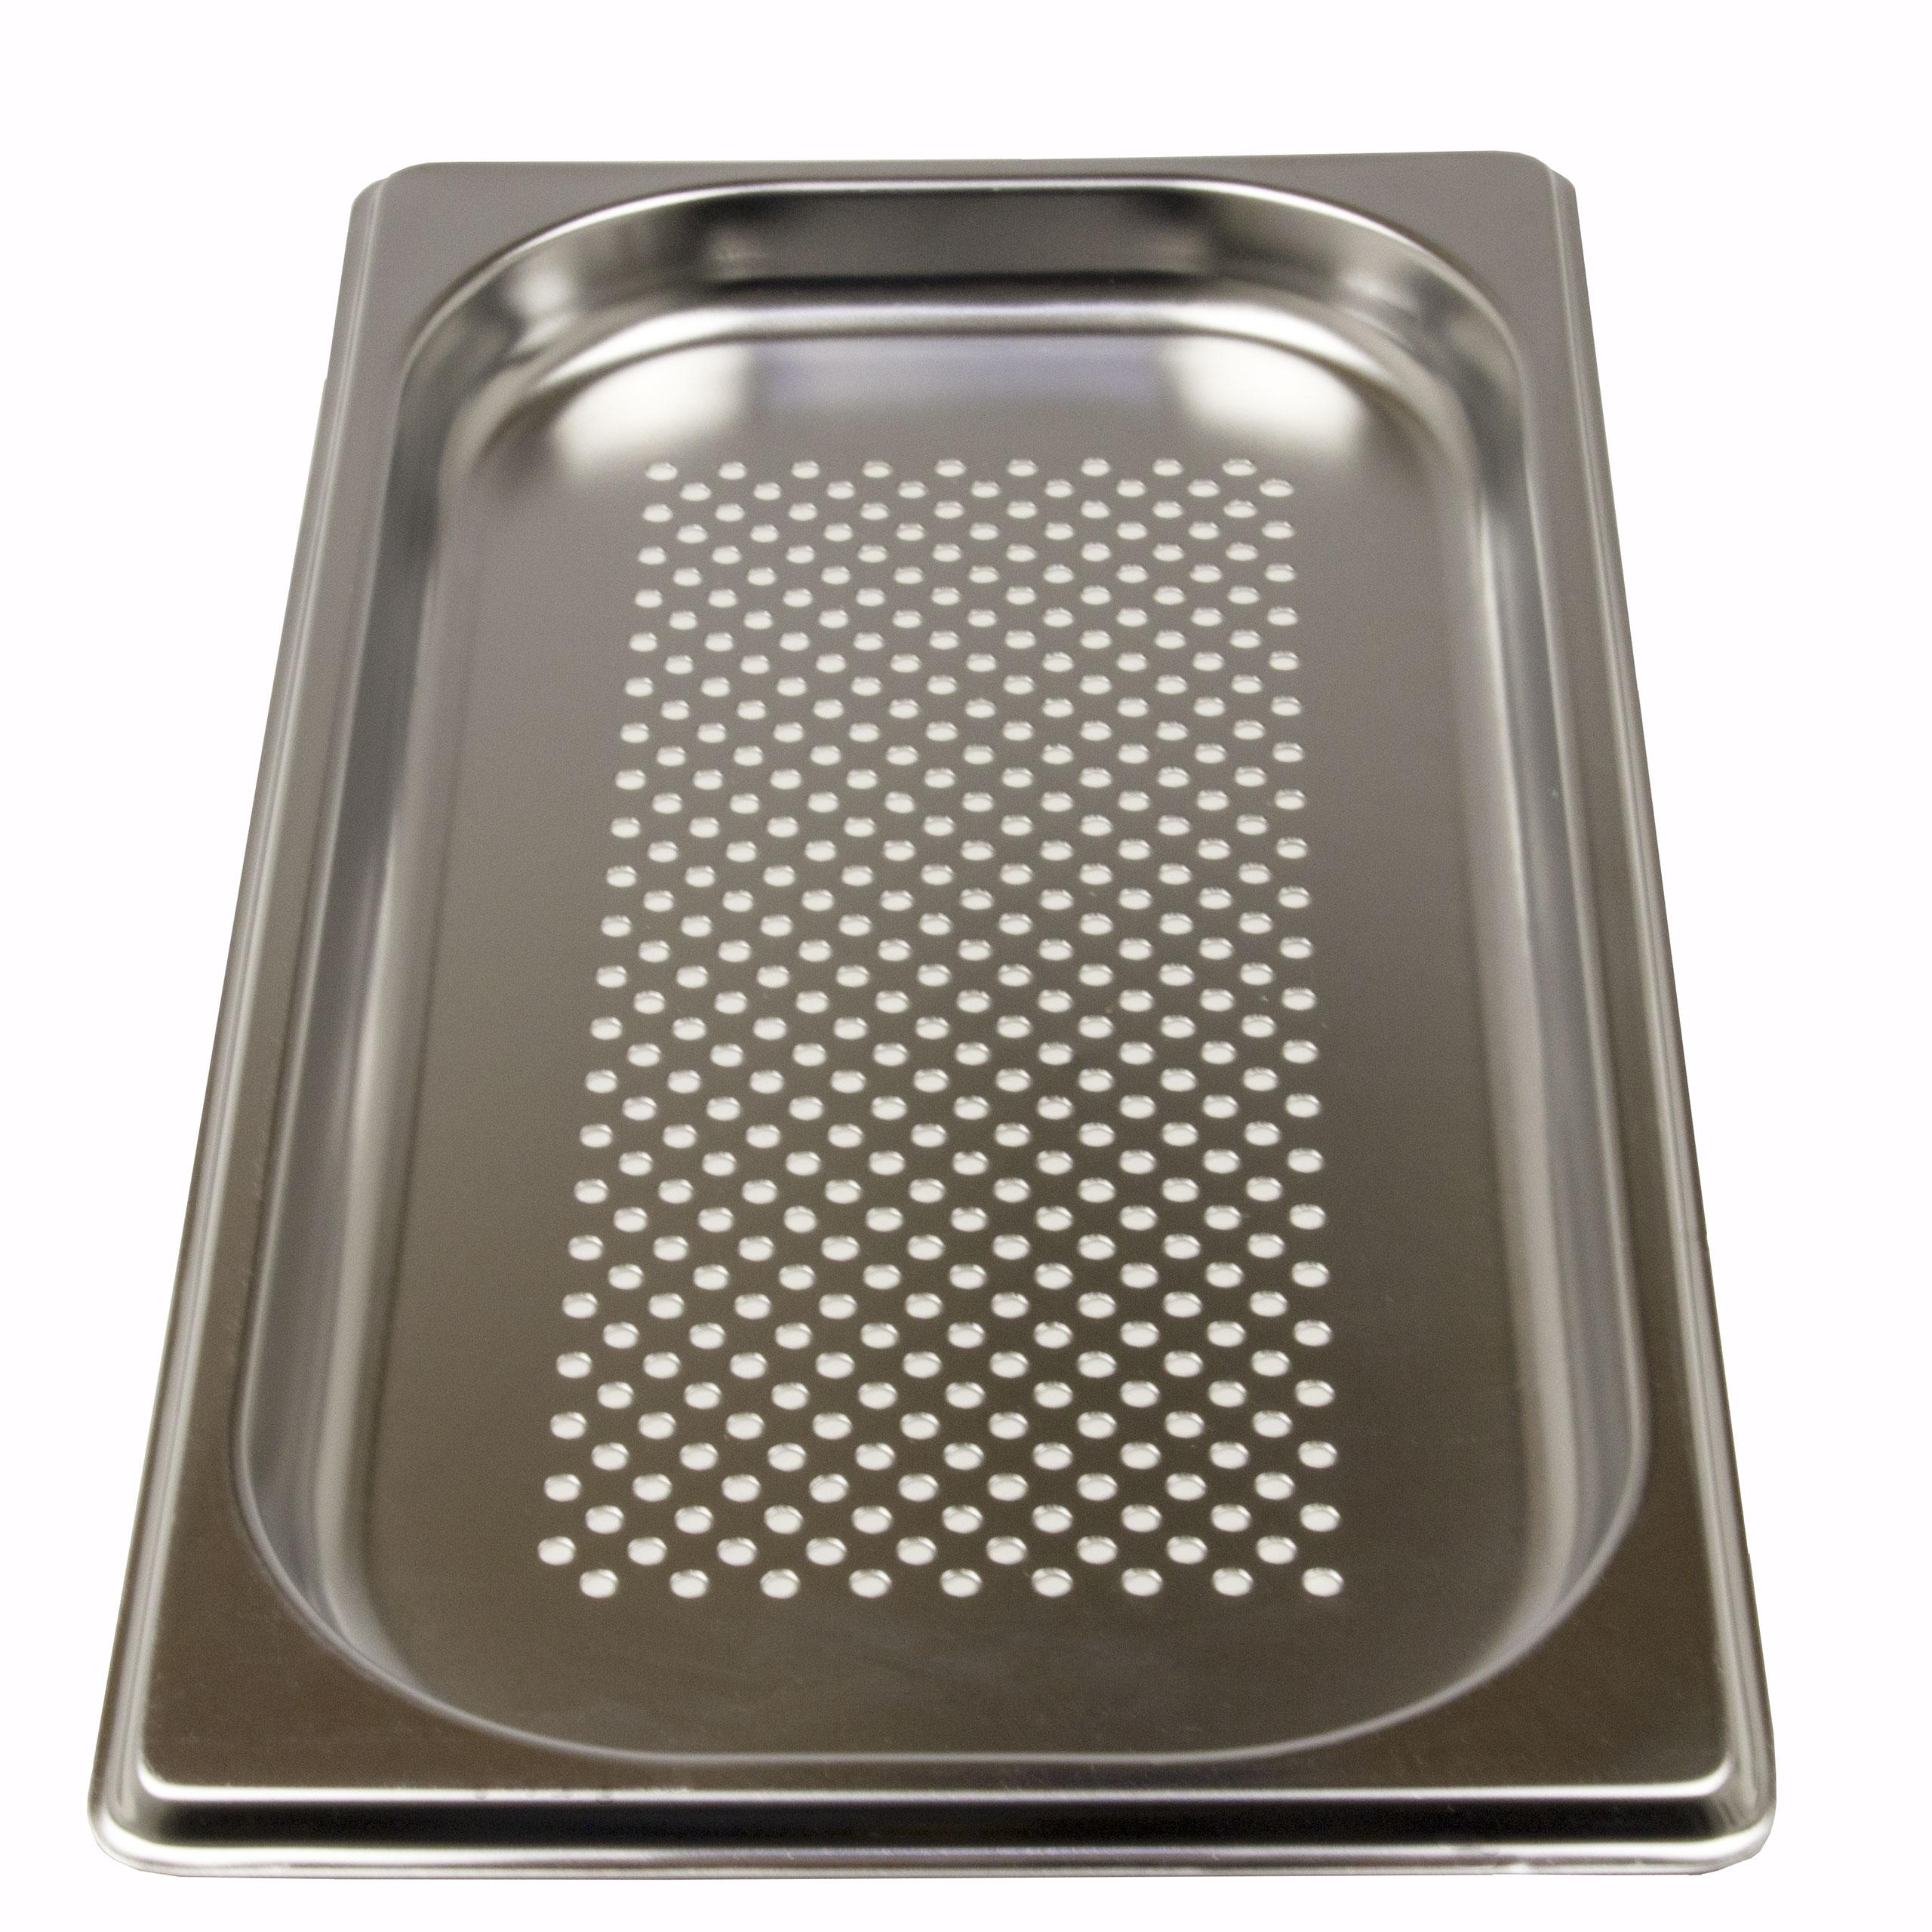 GN 1/2 Gastronormbehälter GN-Behälter Edelstahl 1,25 Liter Tiefe 20mm gelocht